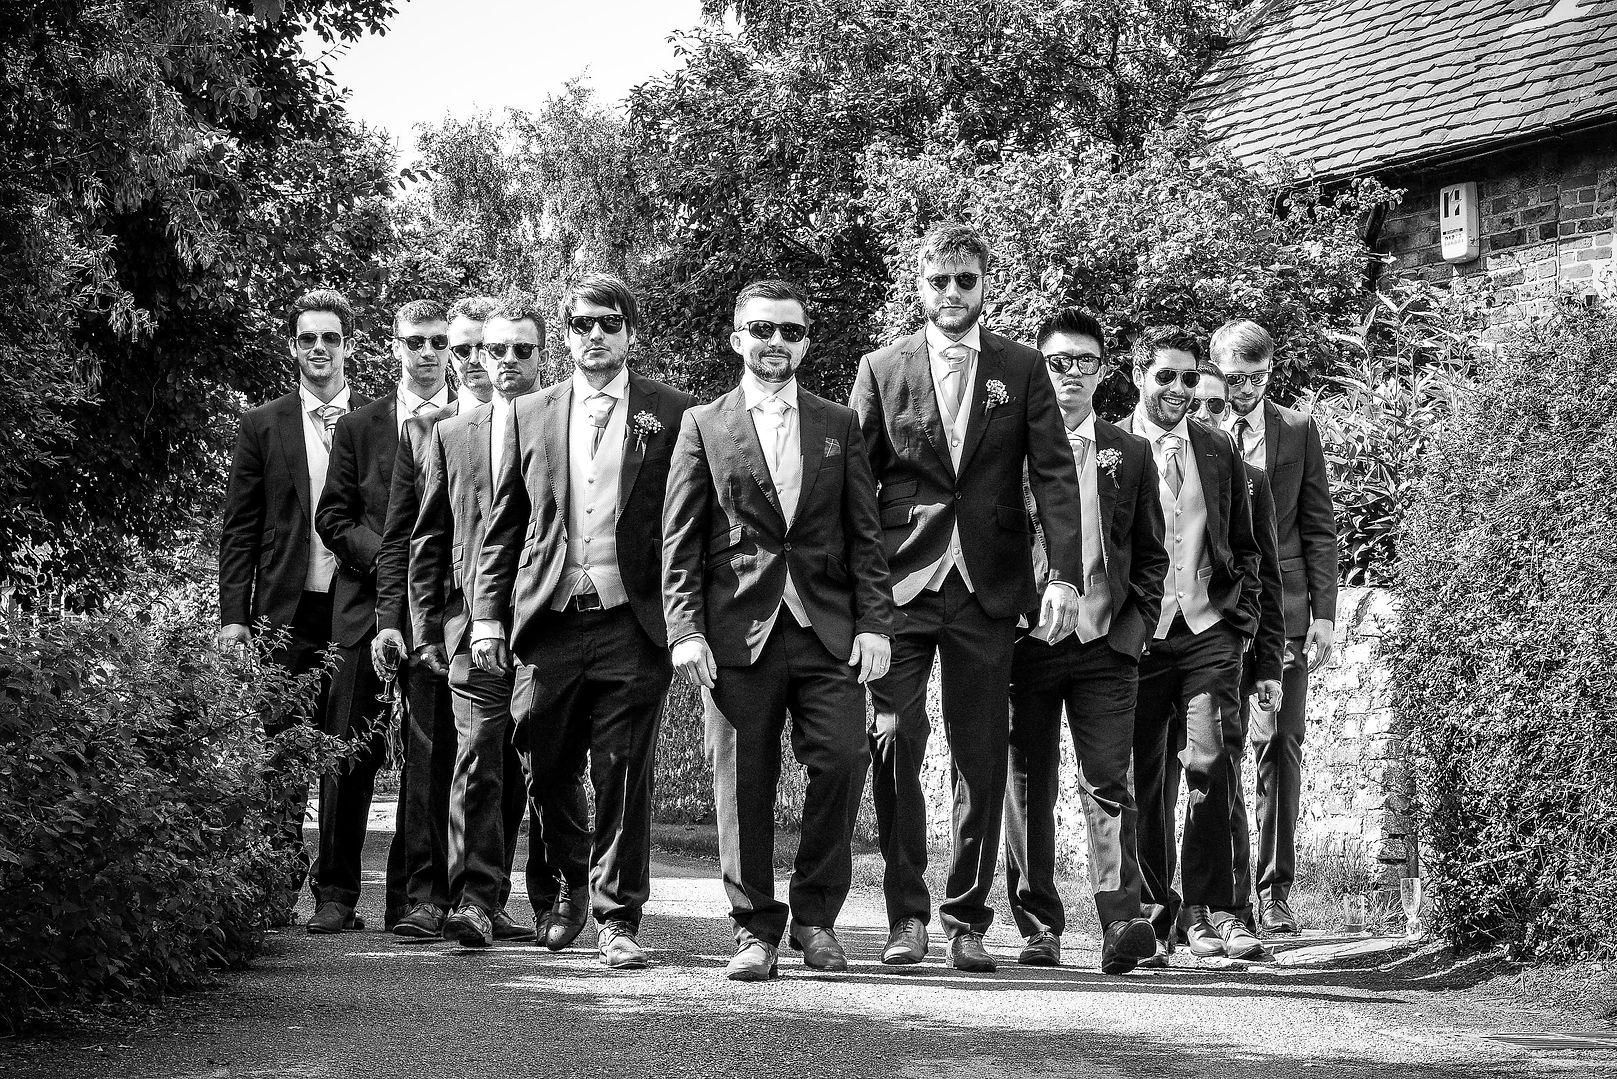 Resovior dogs wedding photograph